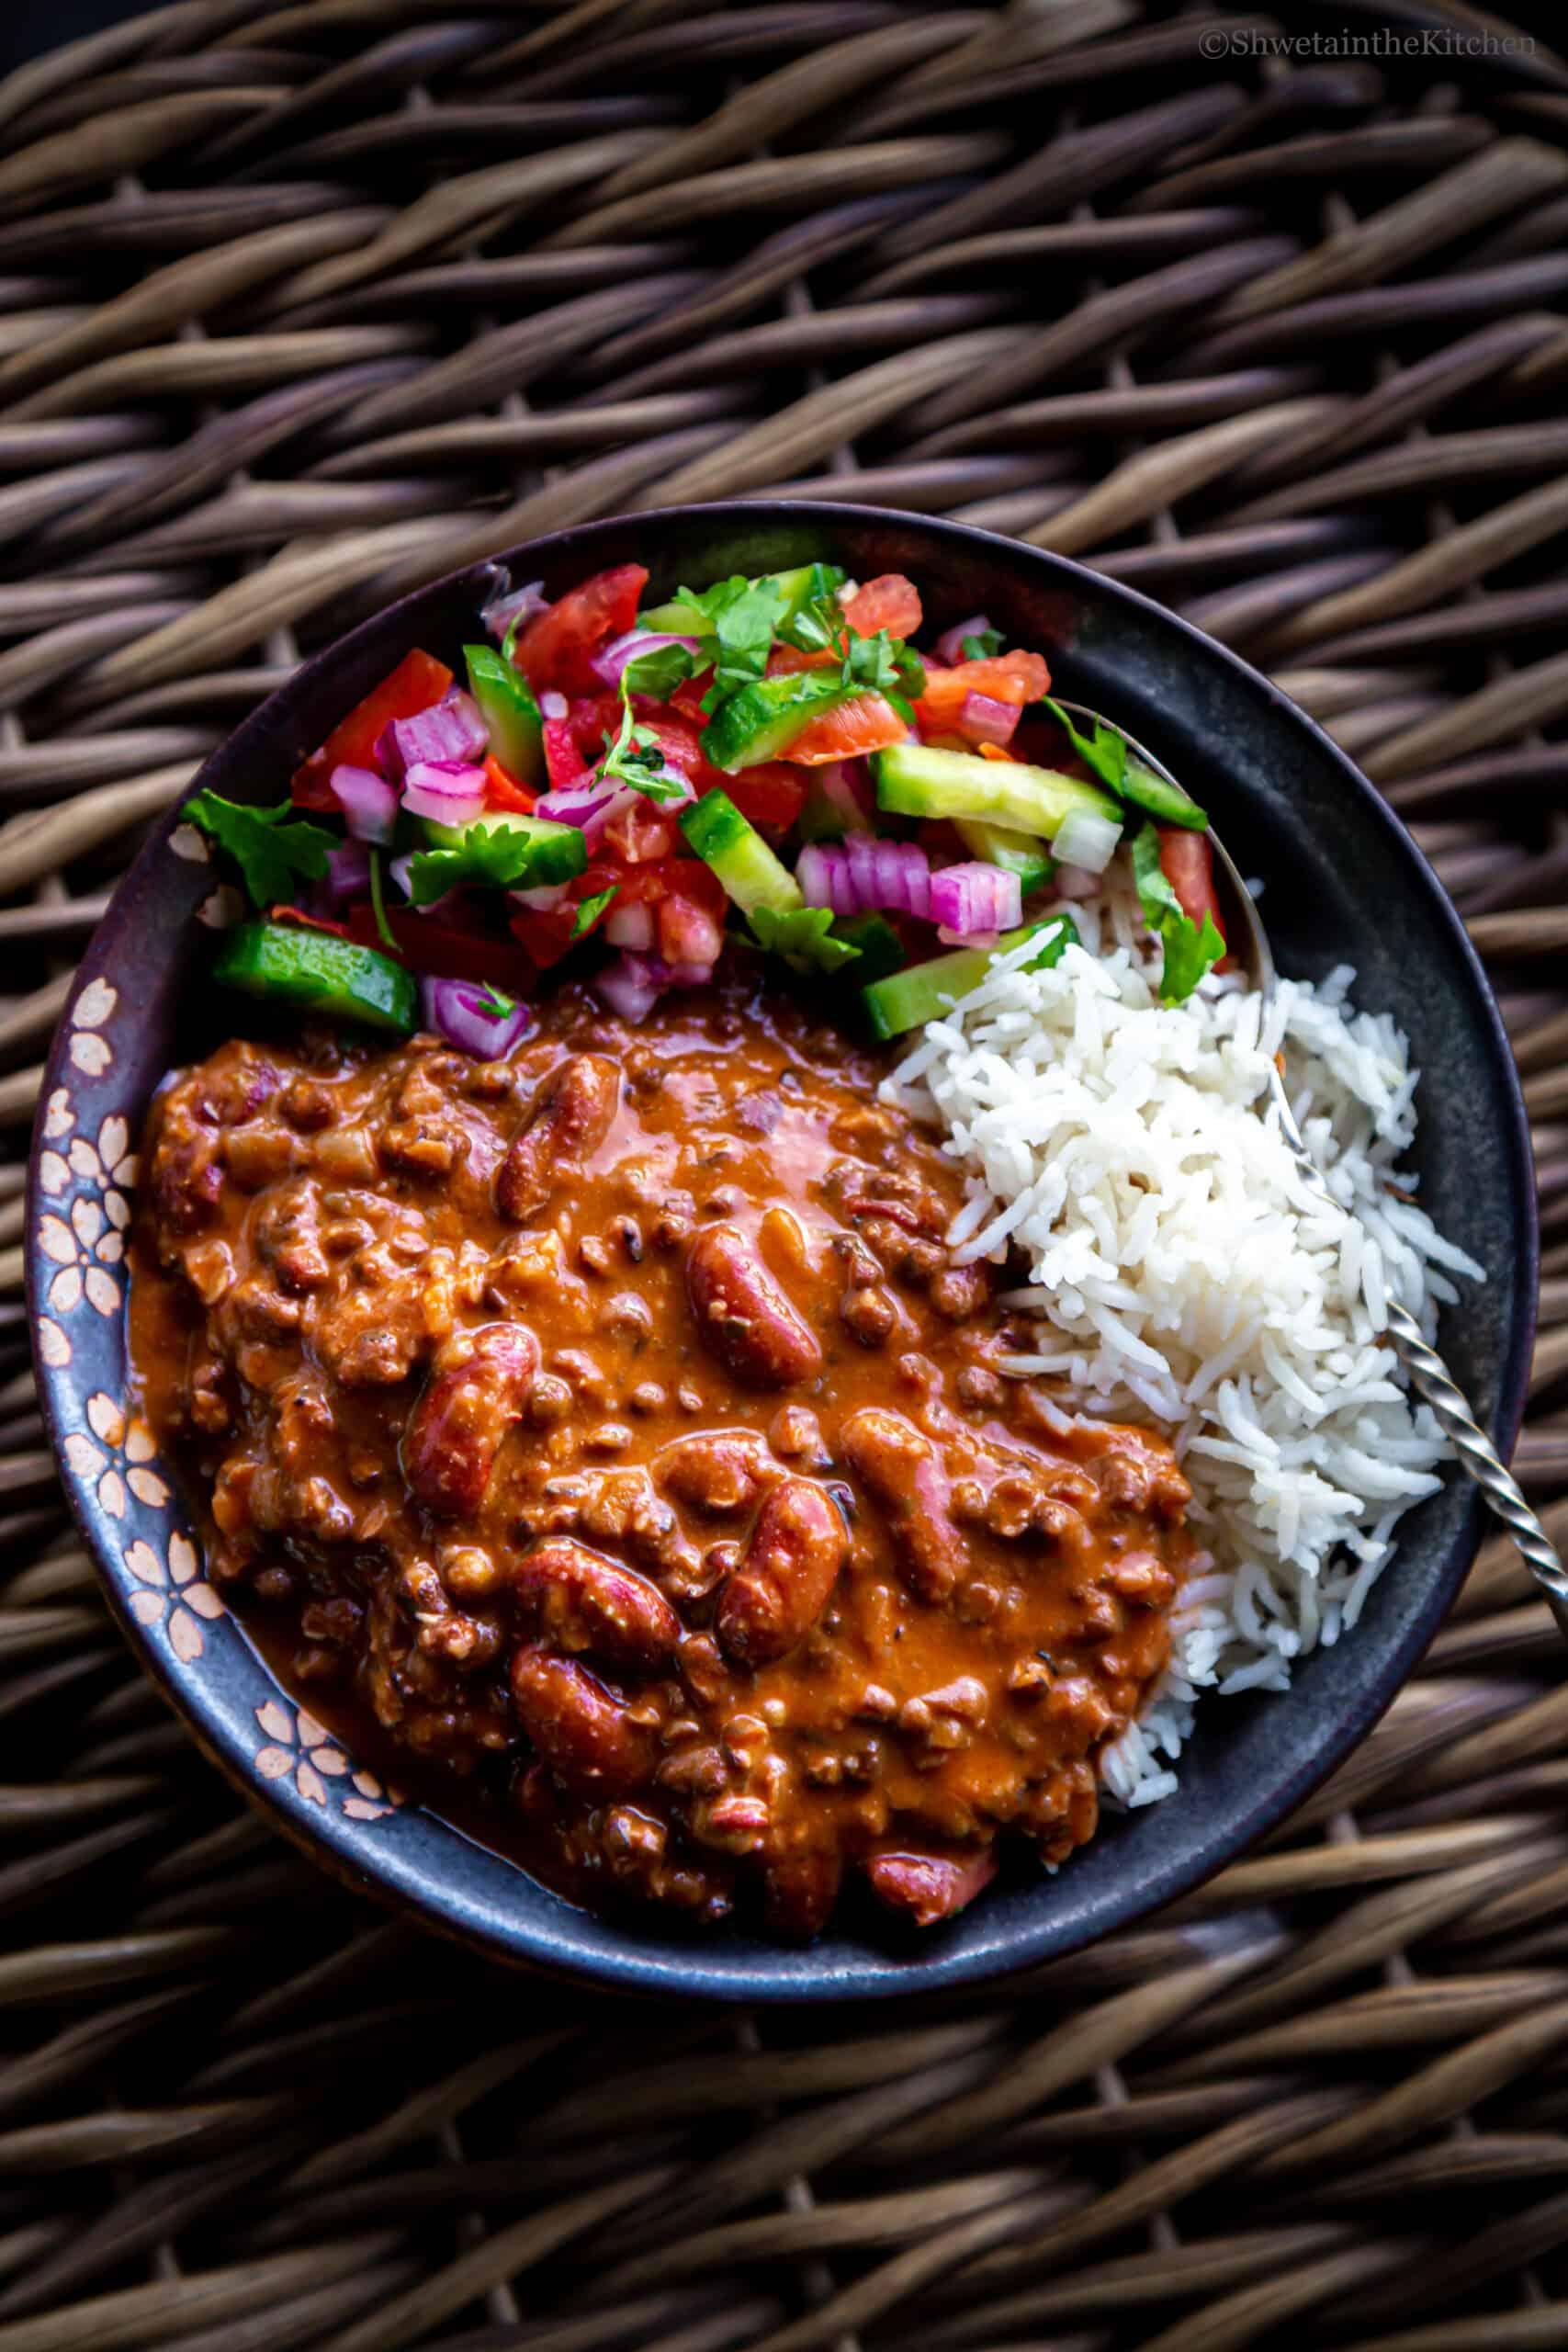 bowl of Dal Makhani, rice and salad together